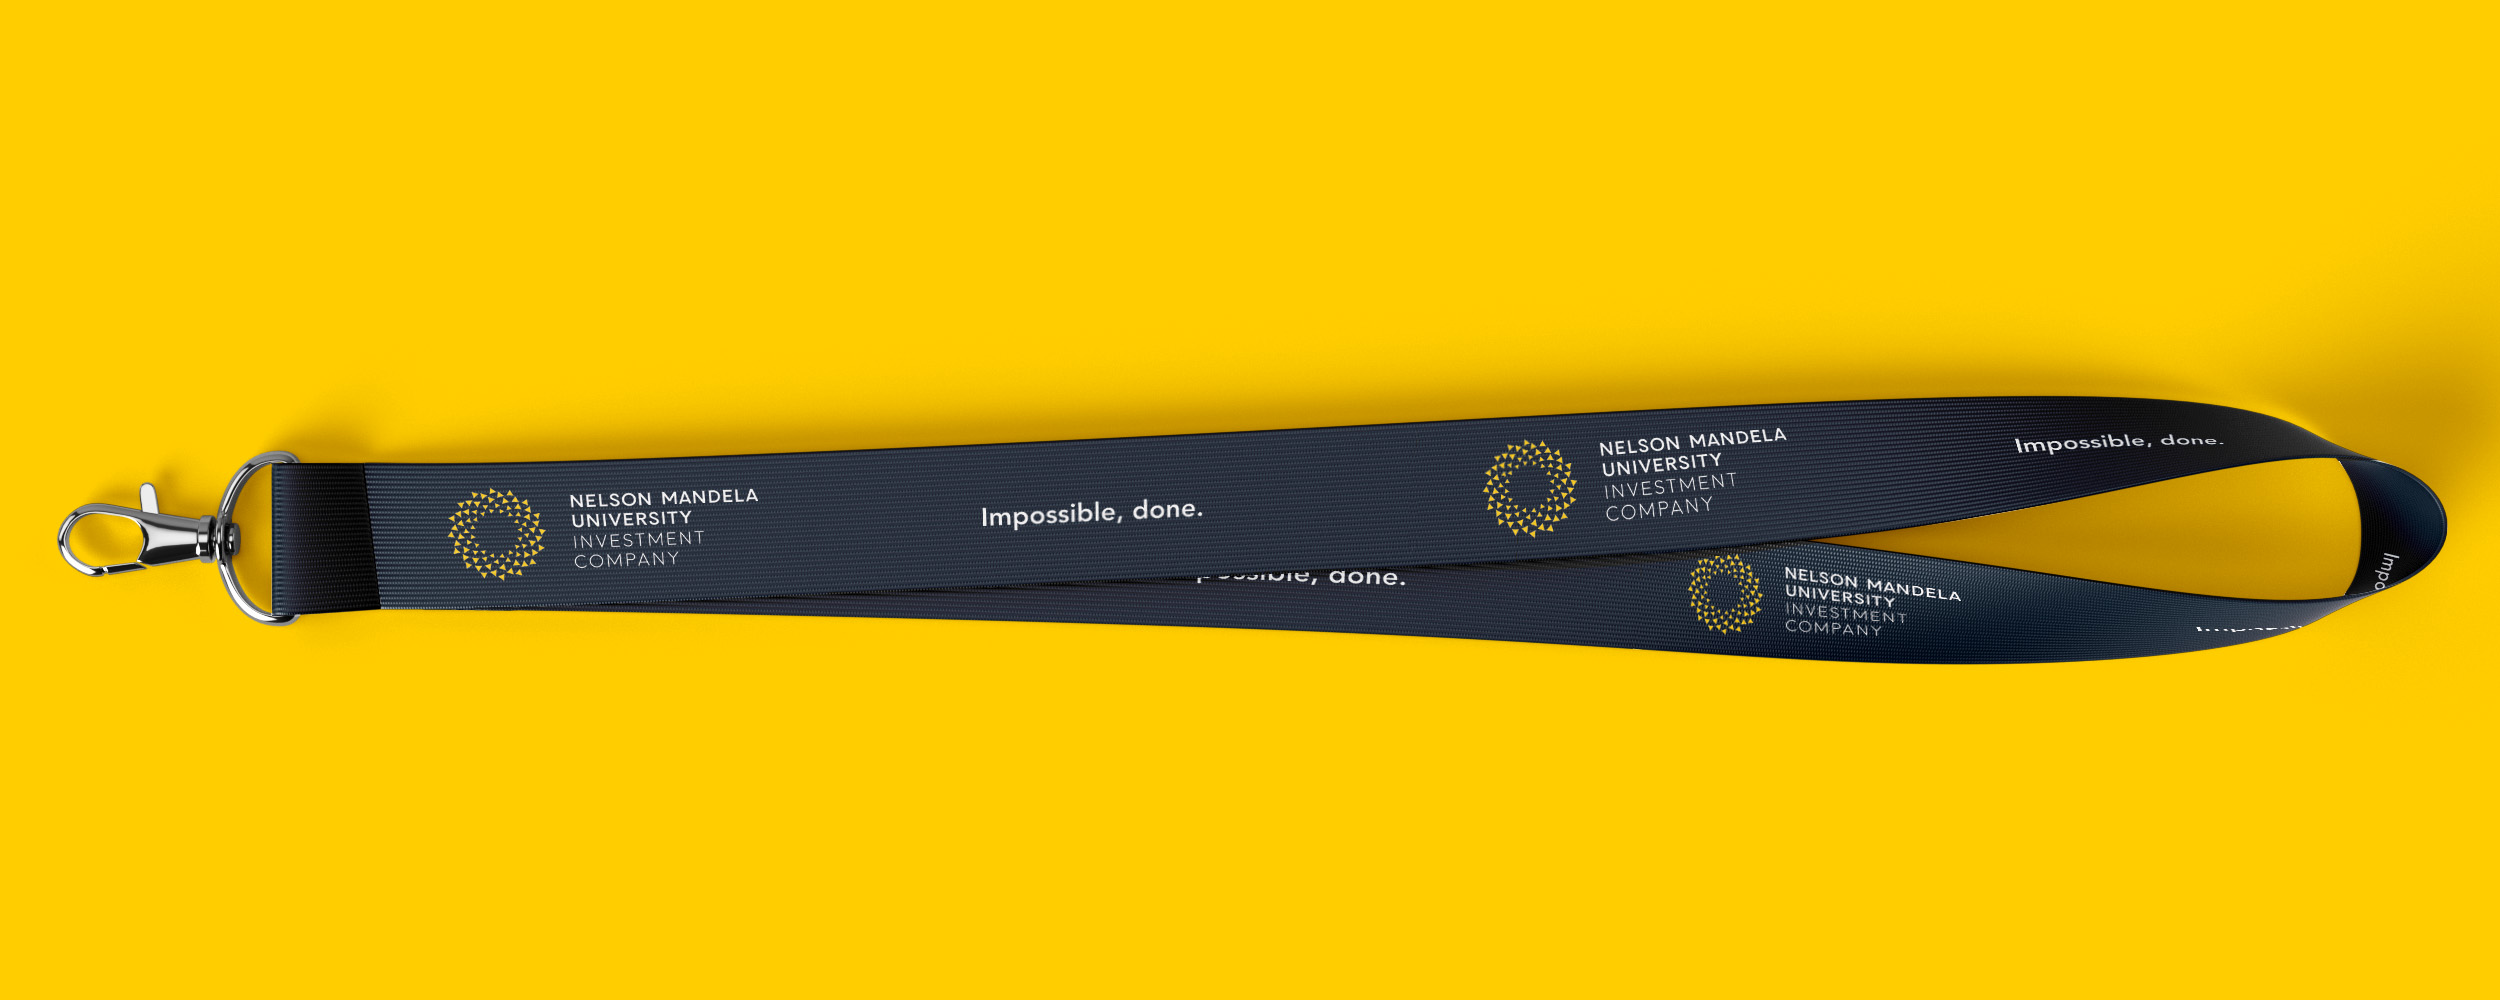 Creative Caterpillar client Nelson Mandela University Investment Company lanyard.